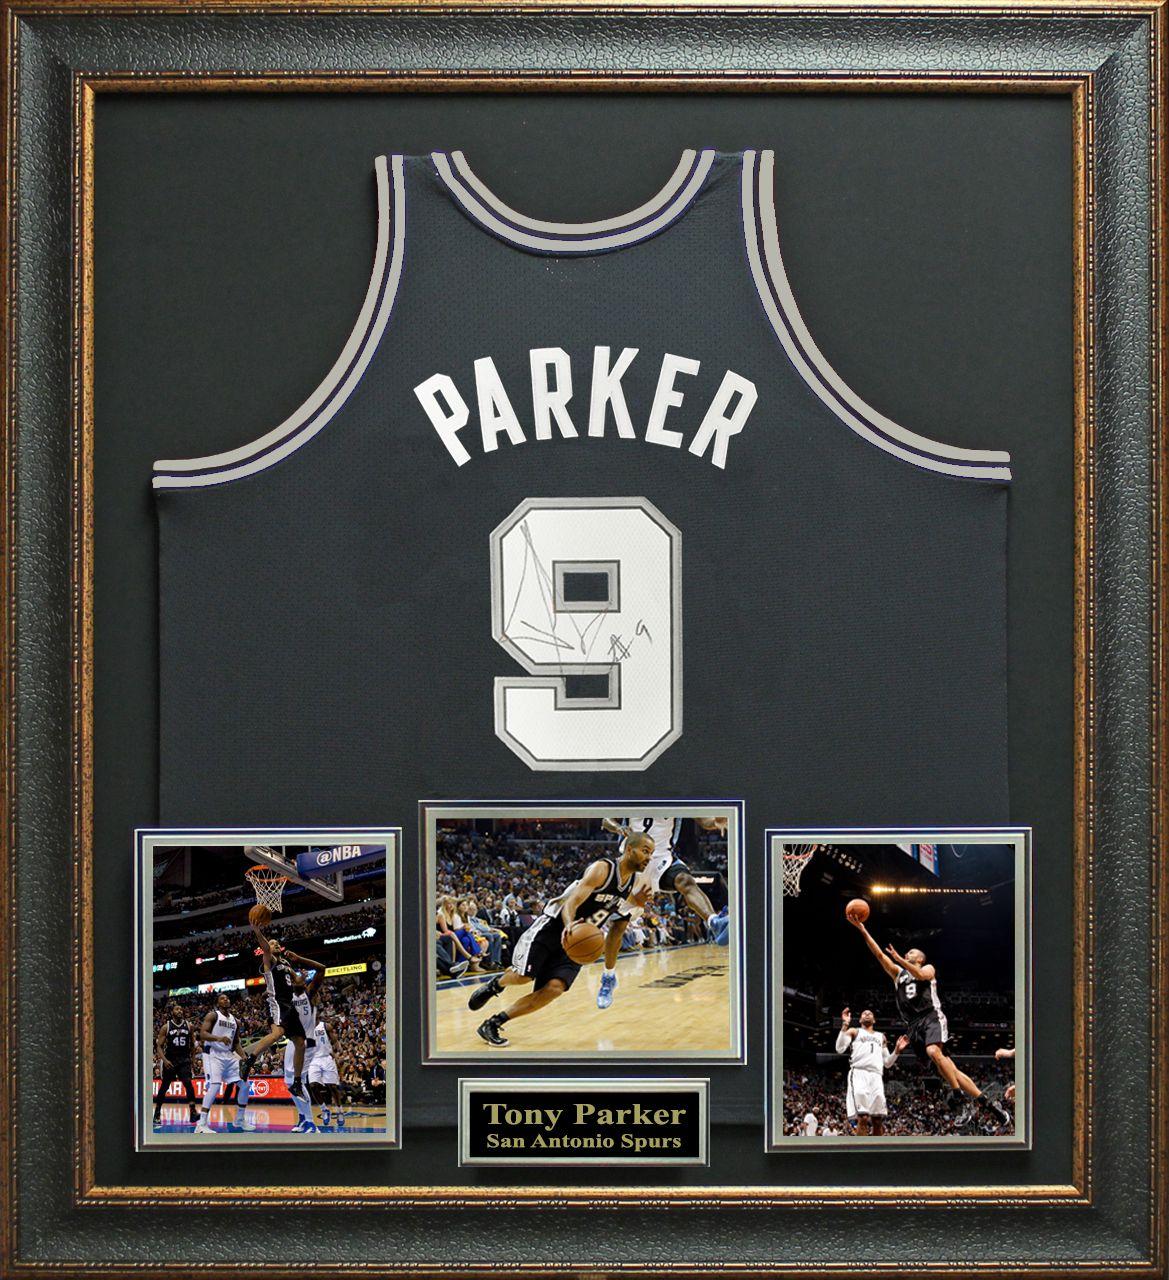 Signature Royale - Tony Parker Signed San Antonio Spurs Jersey Display c71193e0b